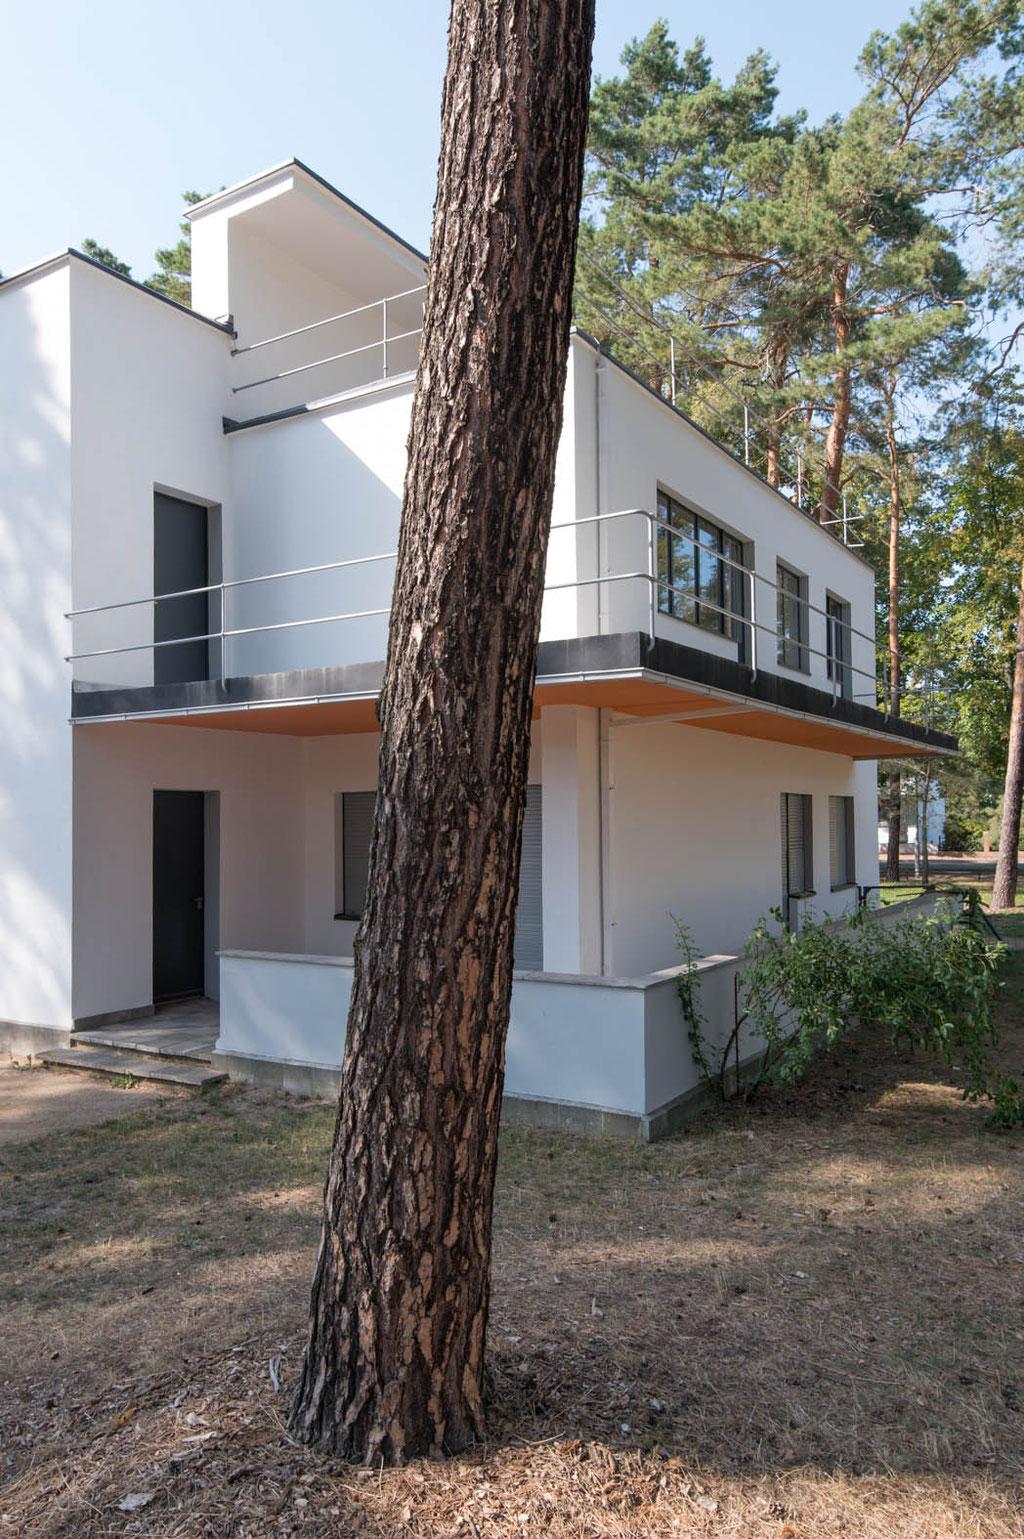 Meisterhäuser (Walter Gropius), Dessau (D)